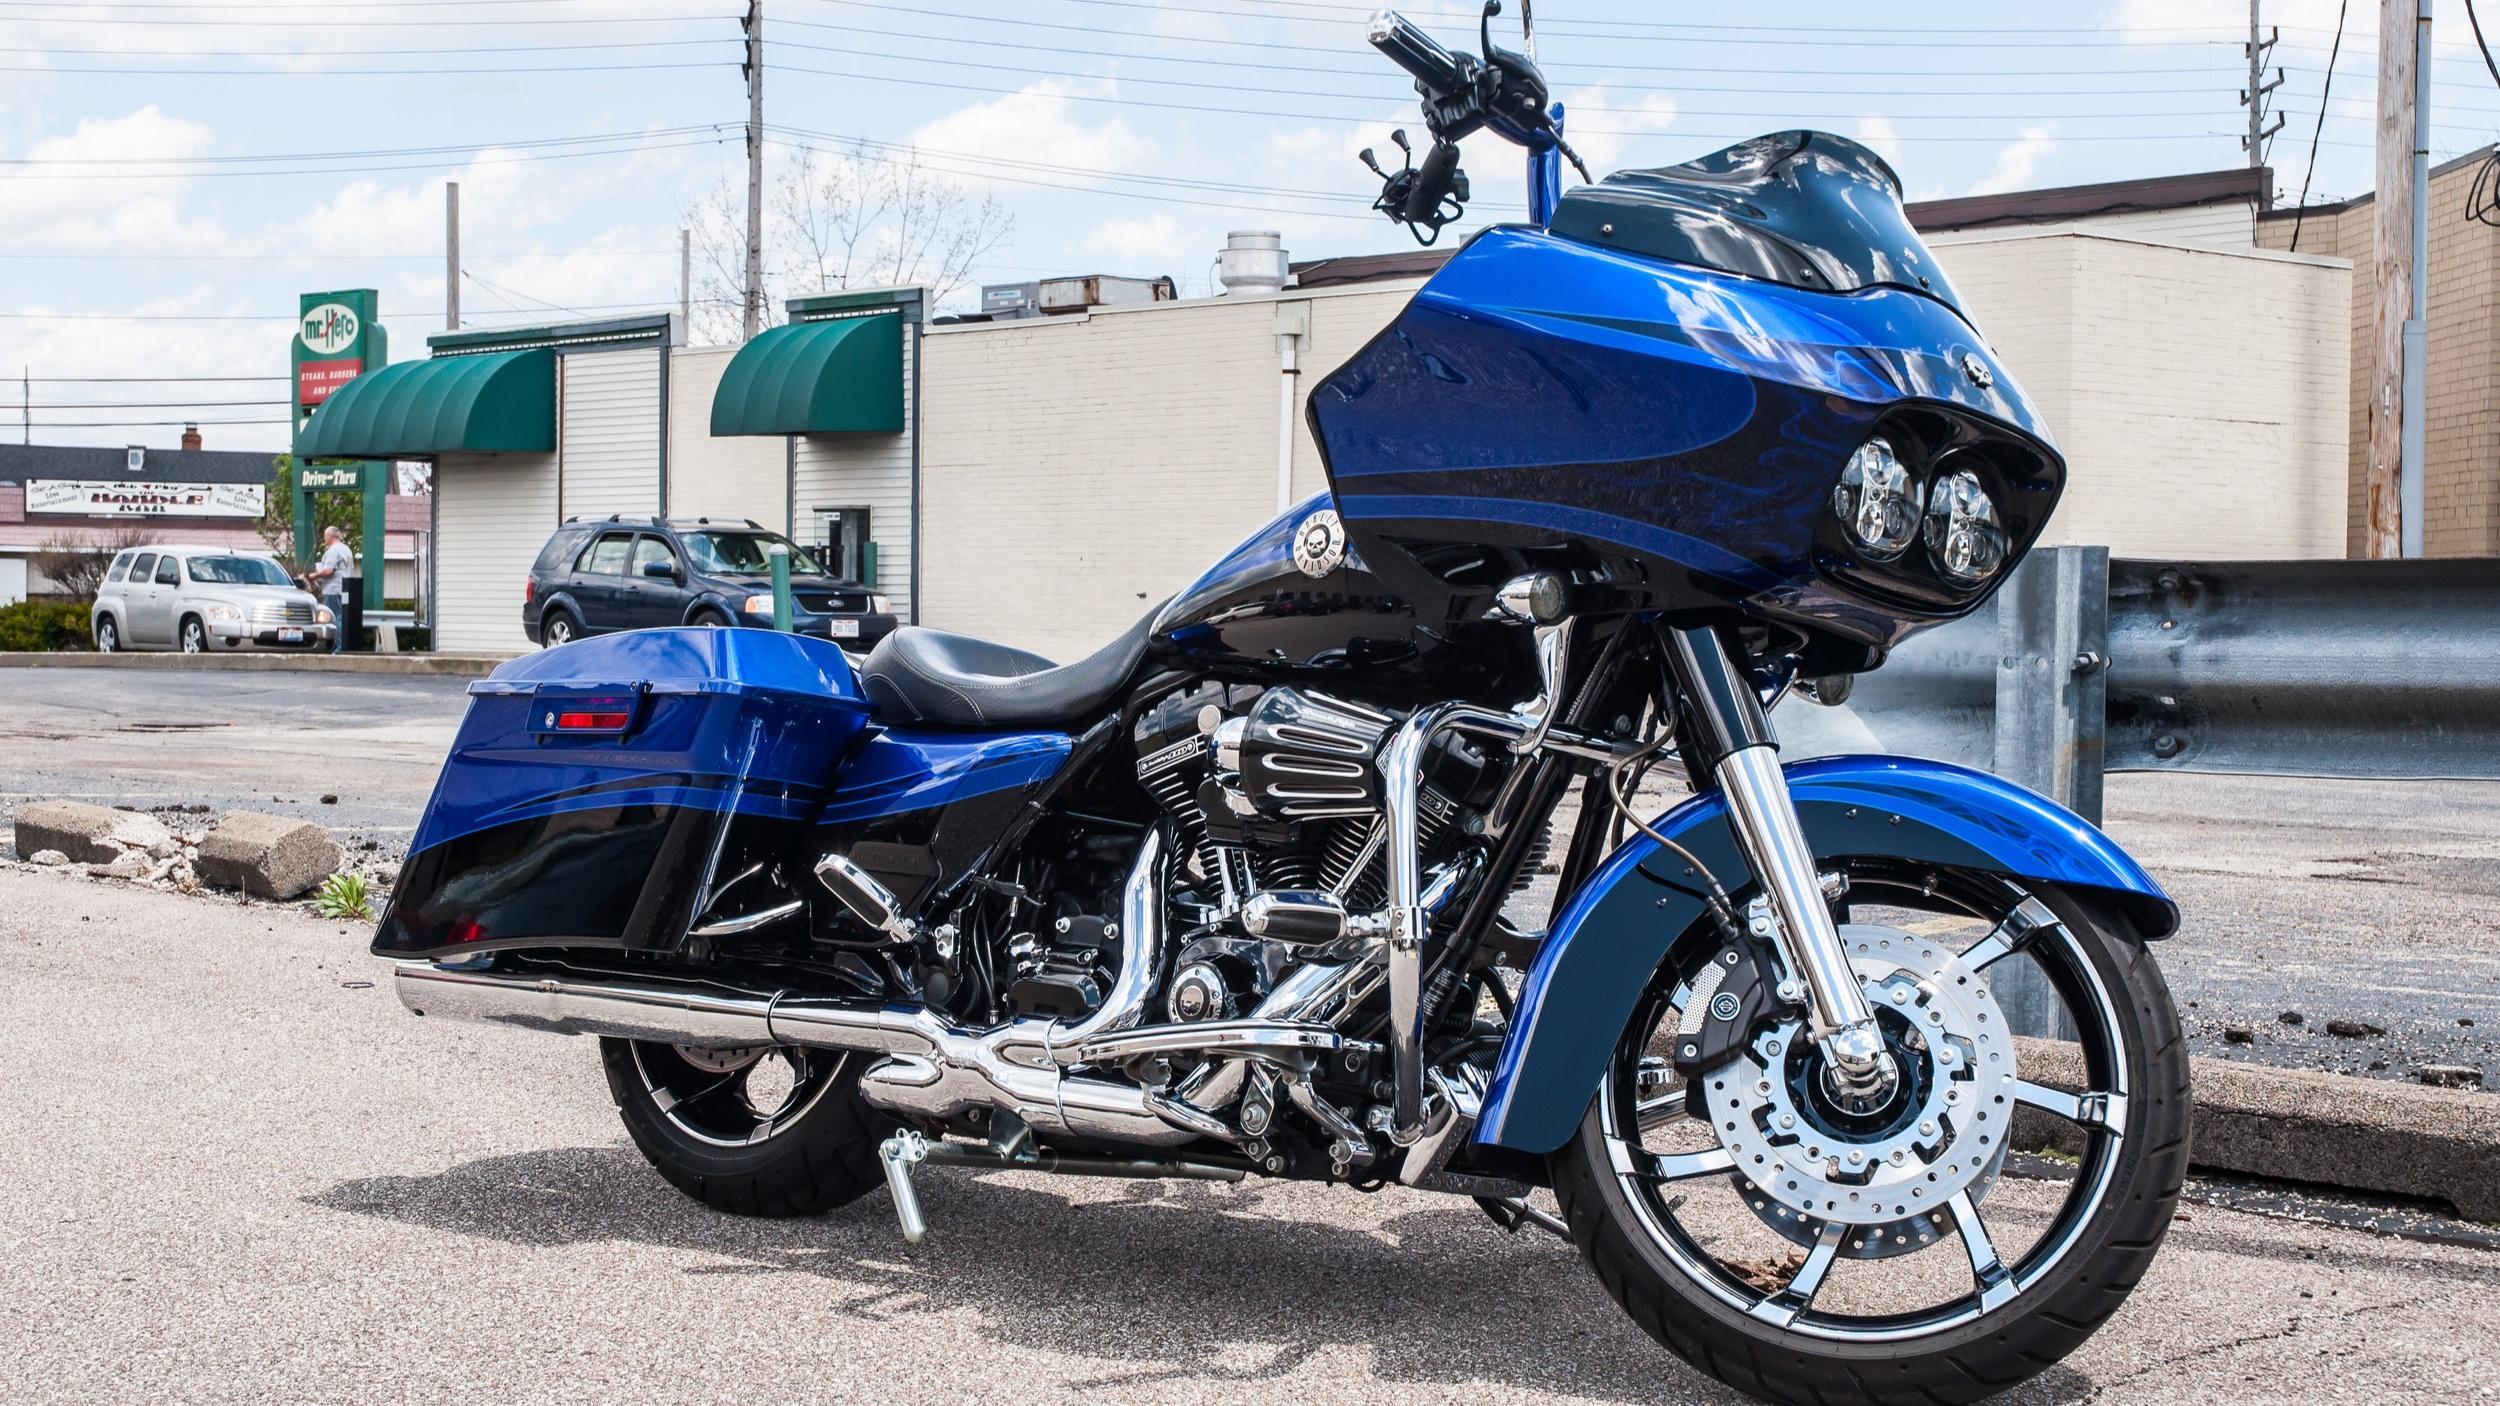 Harley-Davidson CVO Road Glide - Full Paint Correction, Ceramic Pro